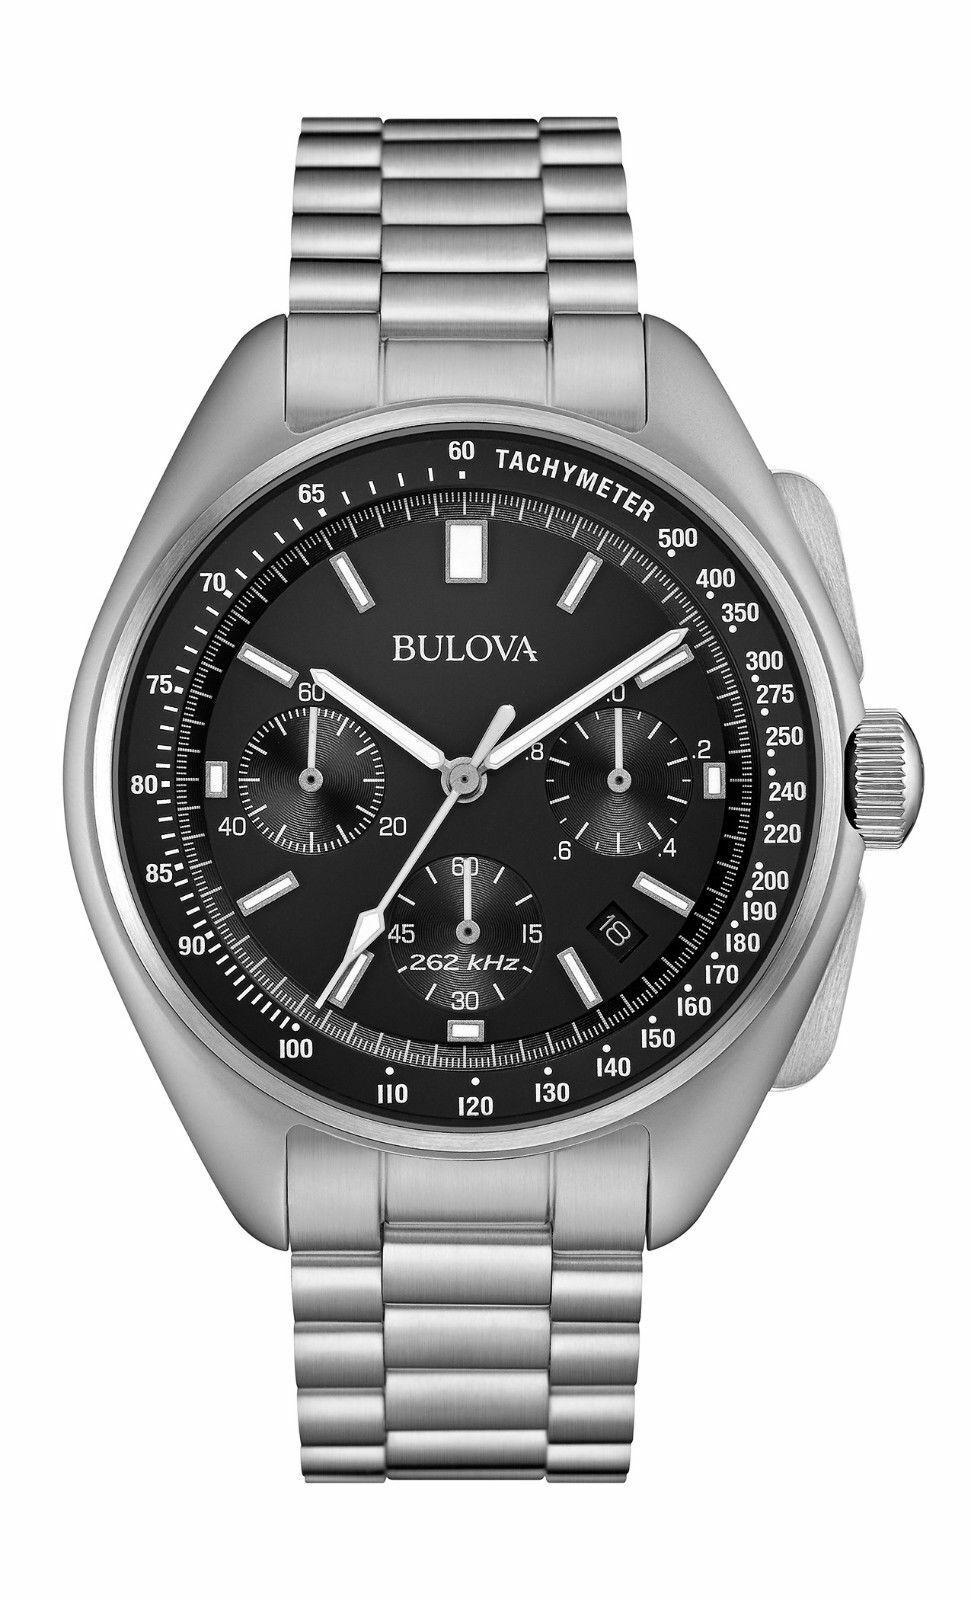 New Bulova Speical Edition Lunar Pilot Chronograph Black Dial Men's Watch 96B258